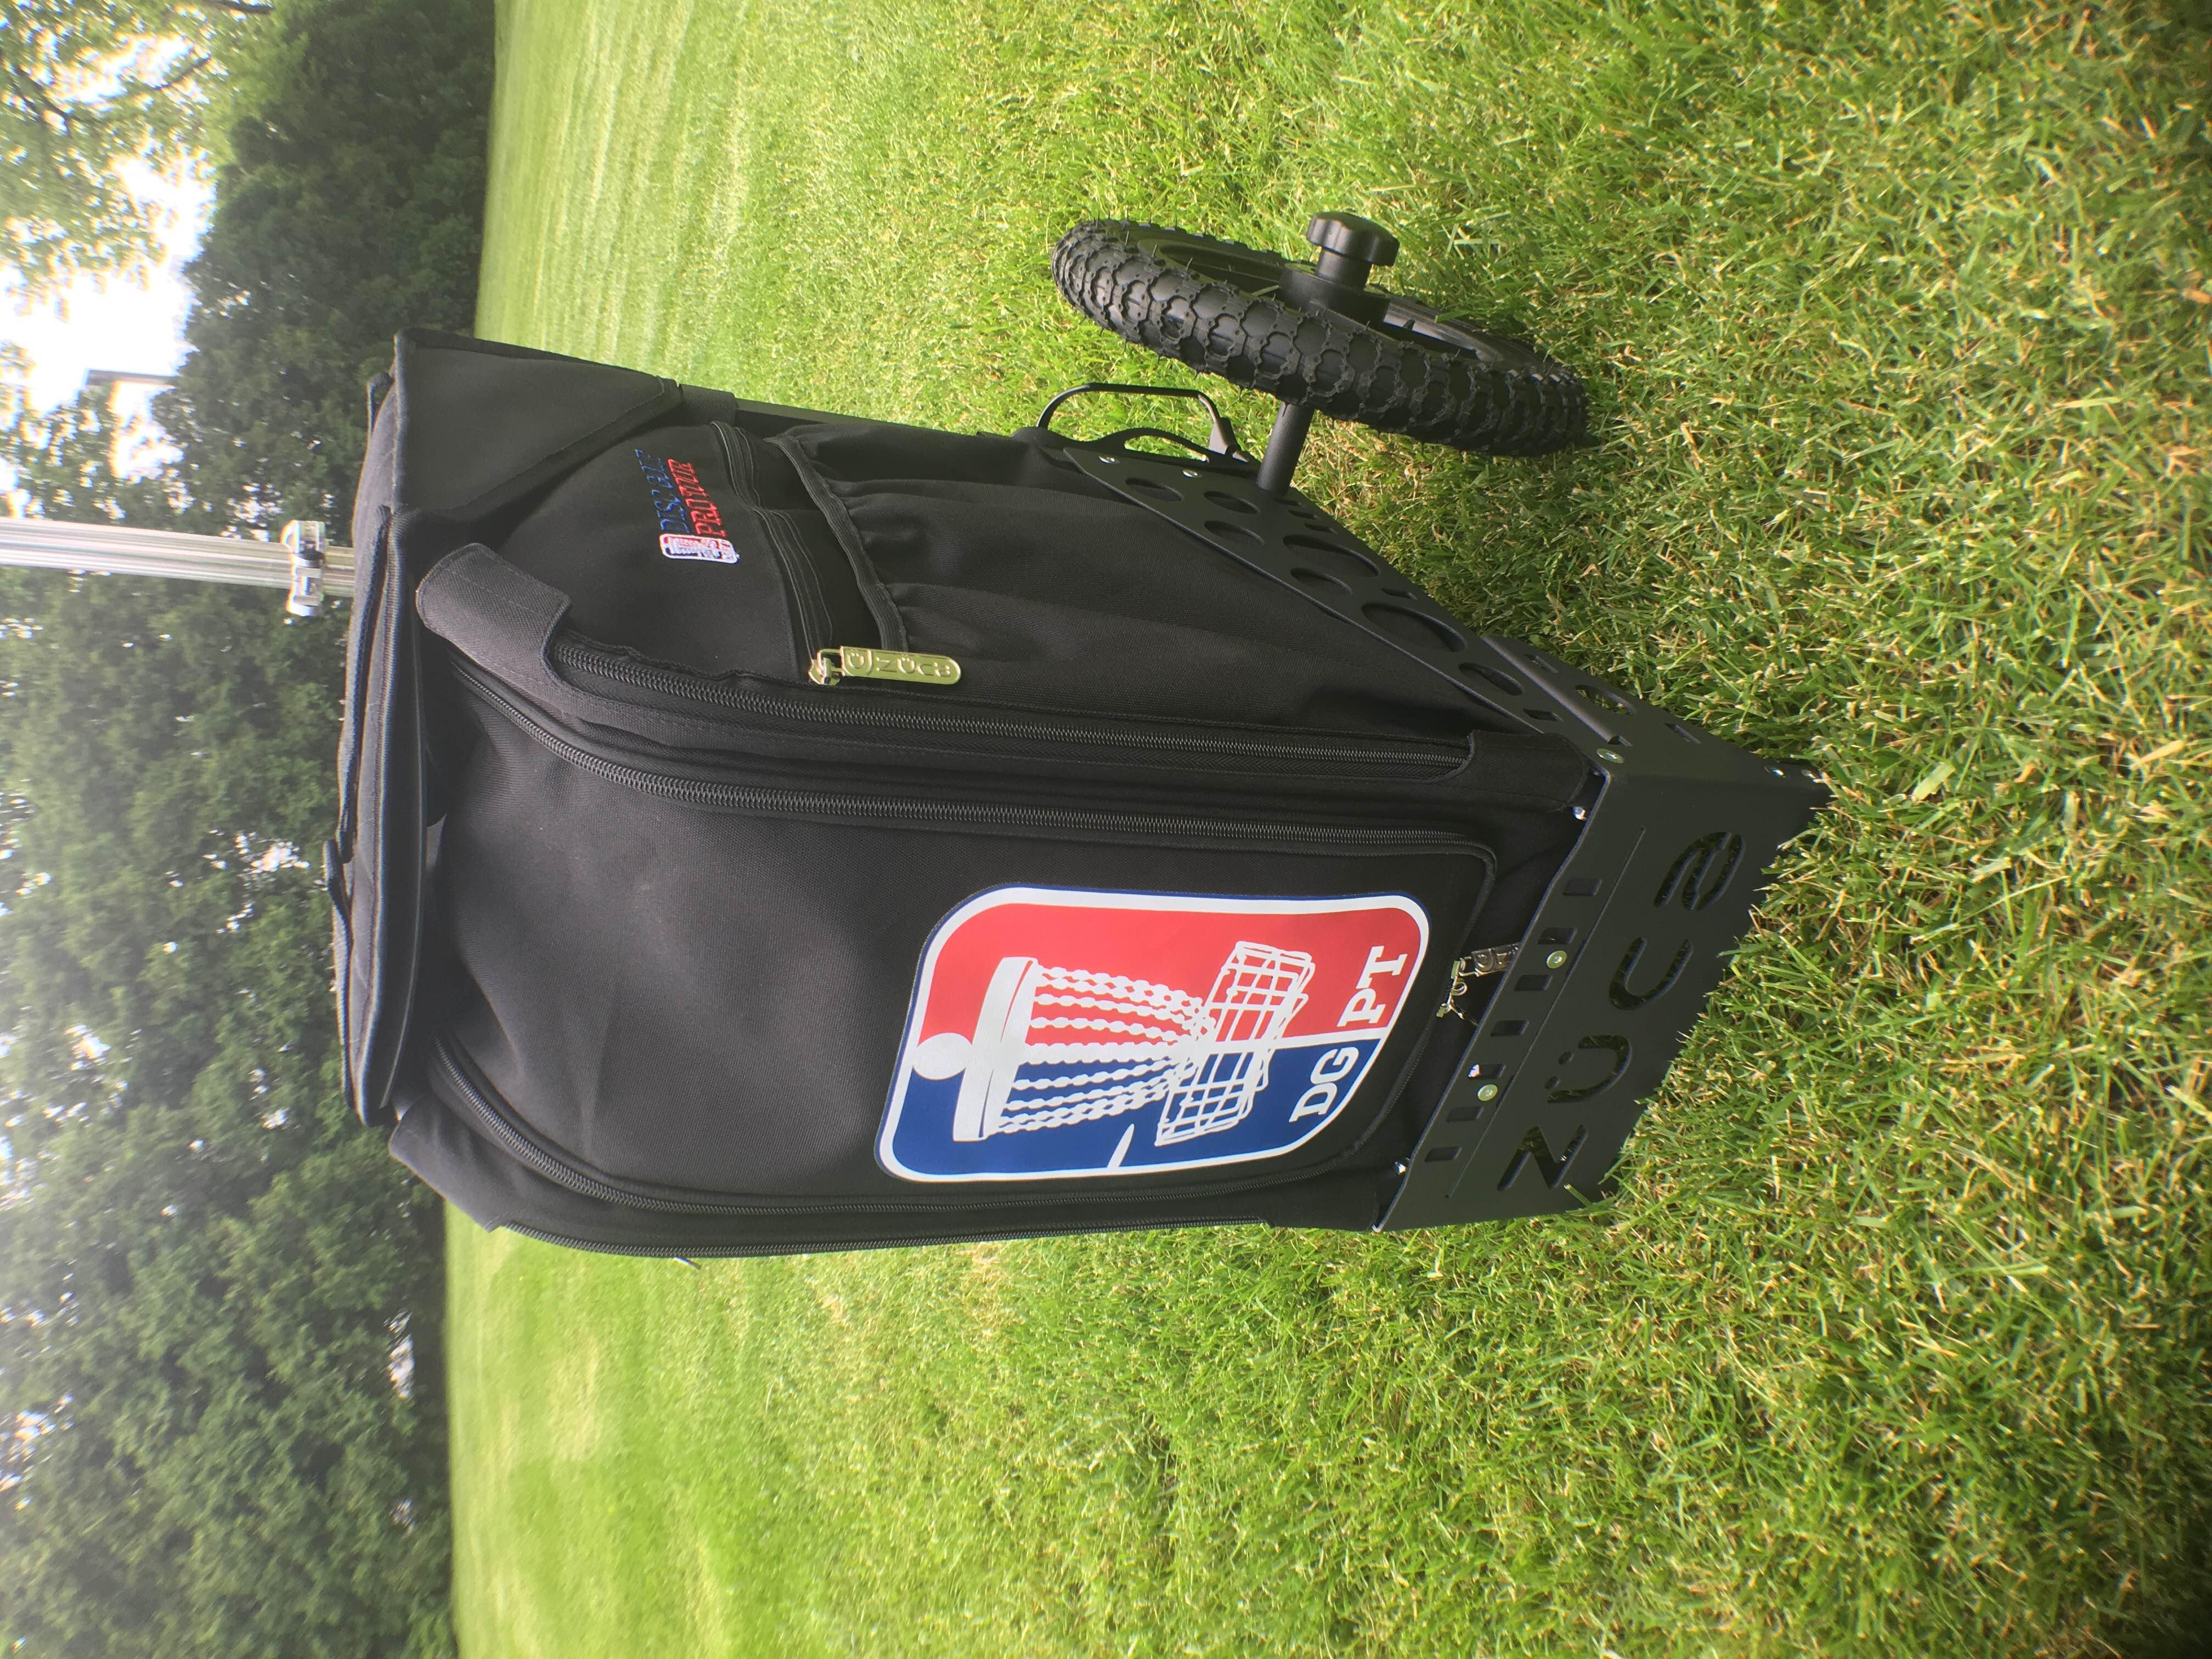 Disc Golf Pro Tour Zuca Cart Discexchange